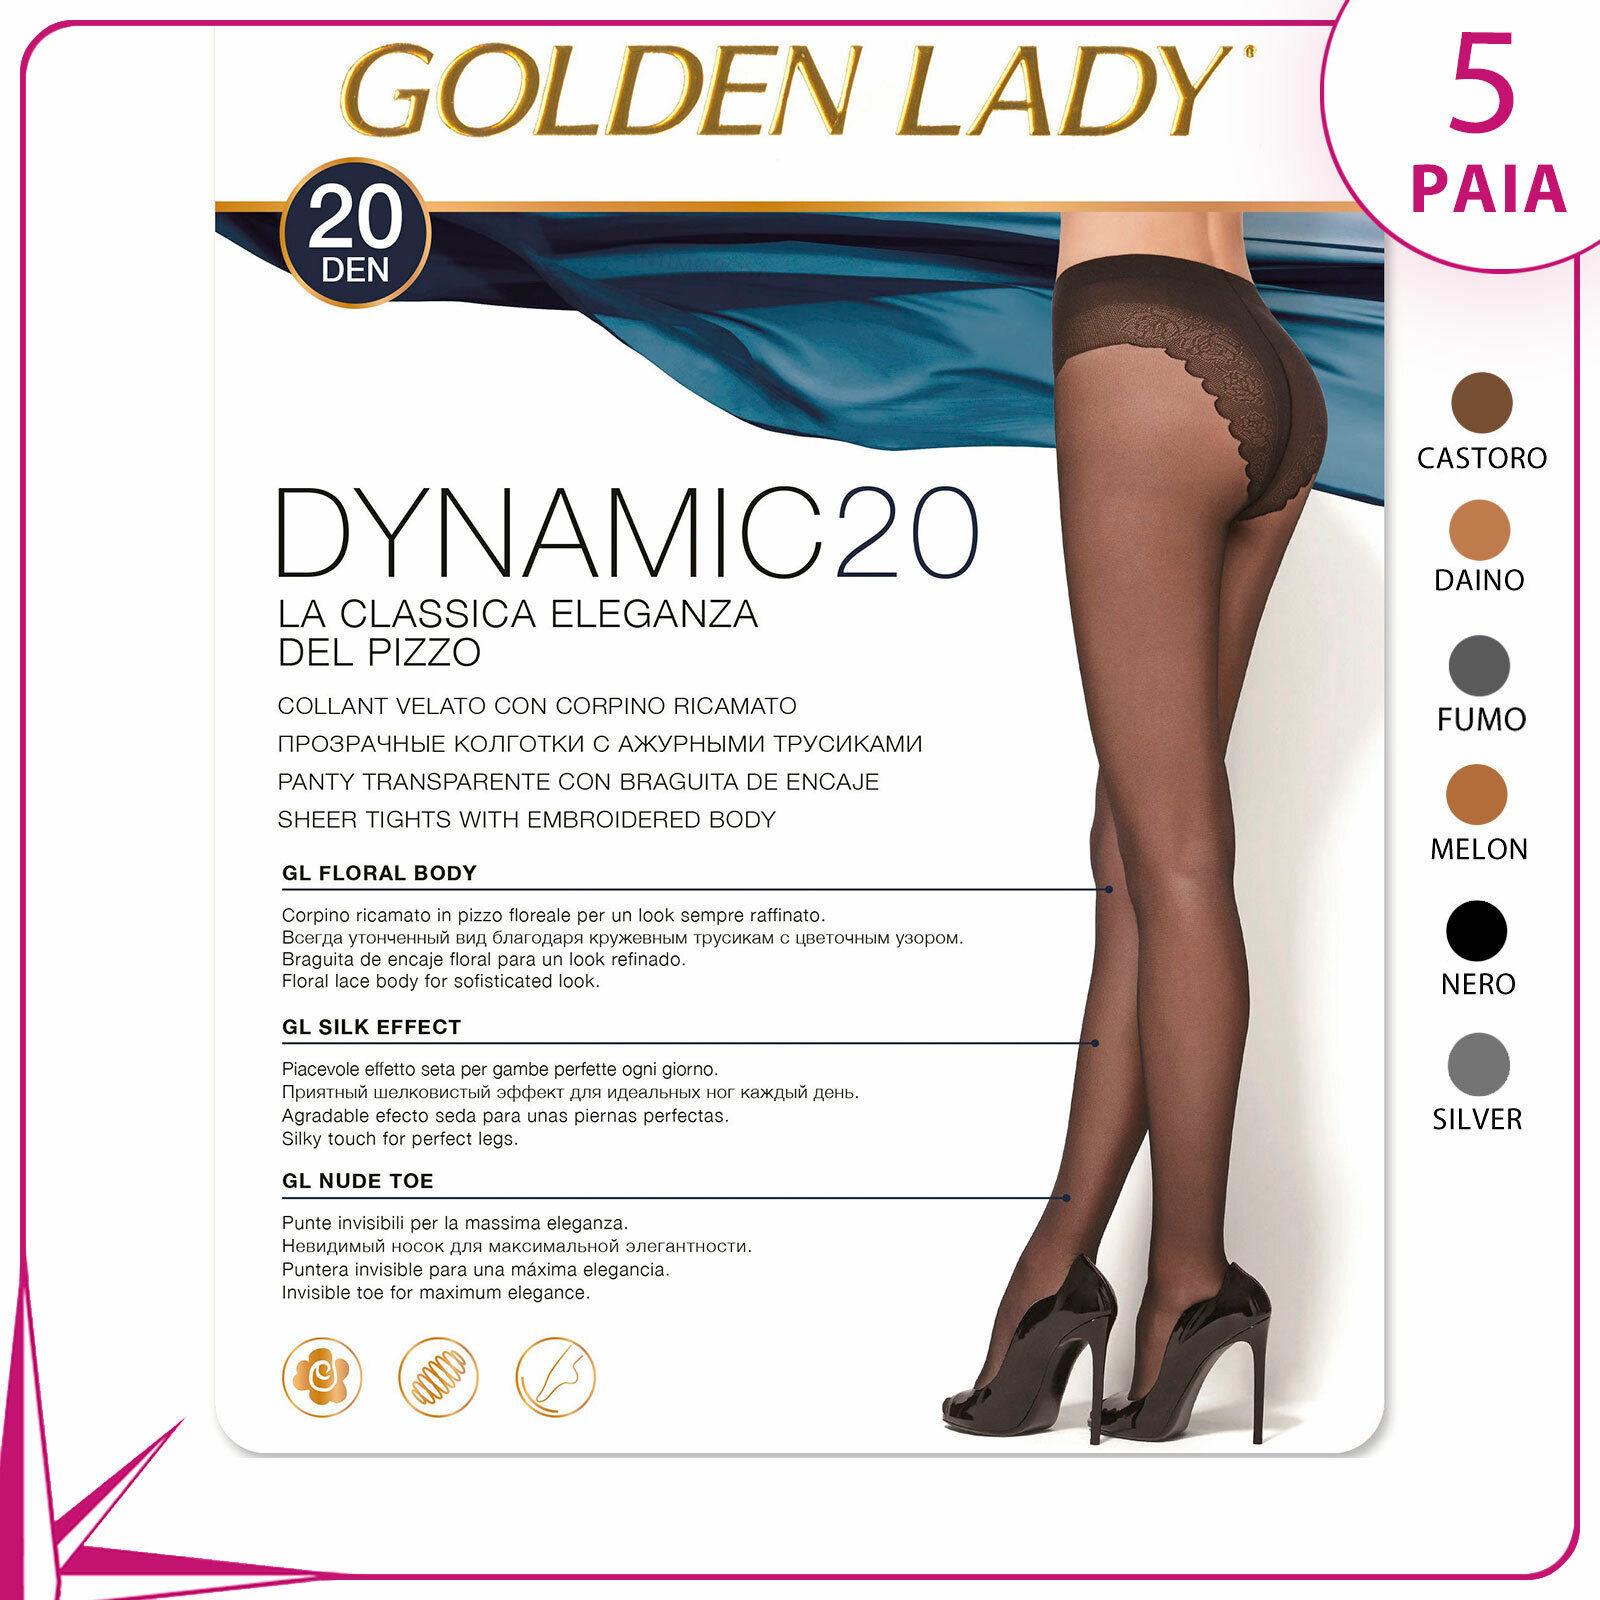 5 Paare Strumpfhose Frau Golden lady Dynamic 20 Höhle Höschen Spitze